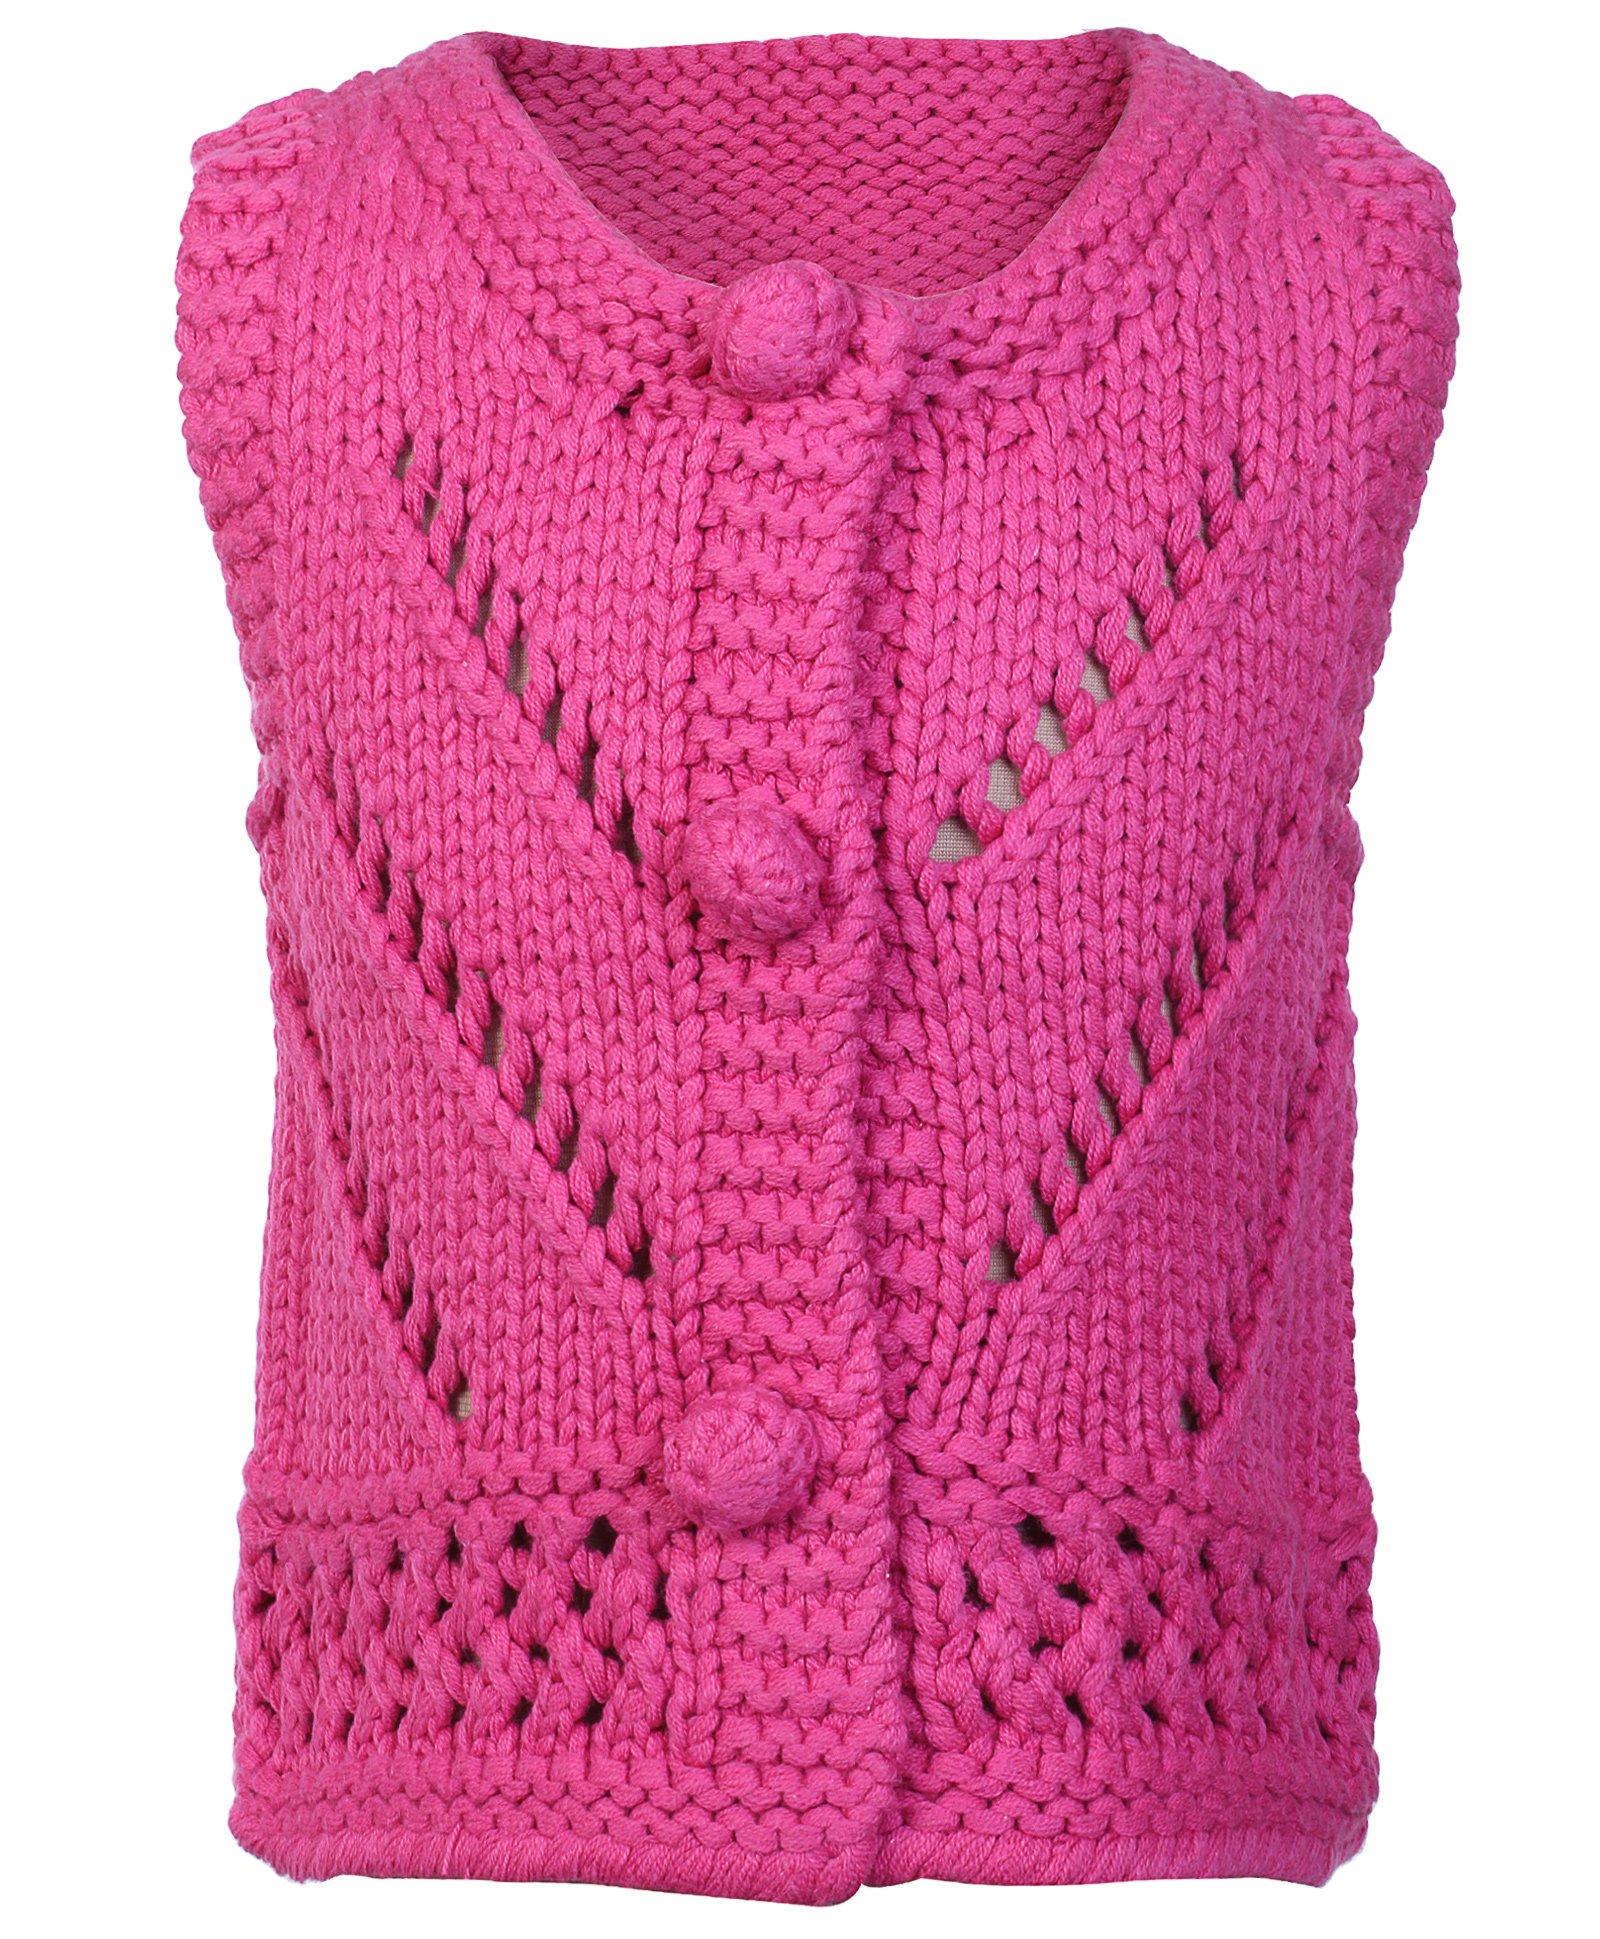 Handmade Woolen Sweaters For Girls